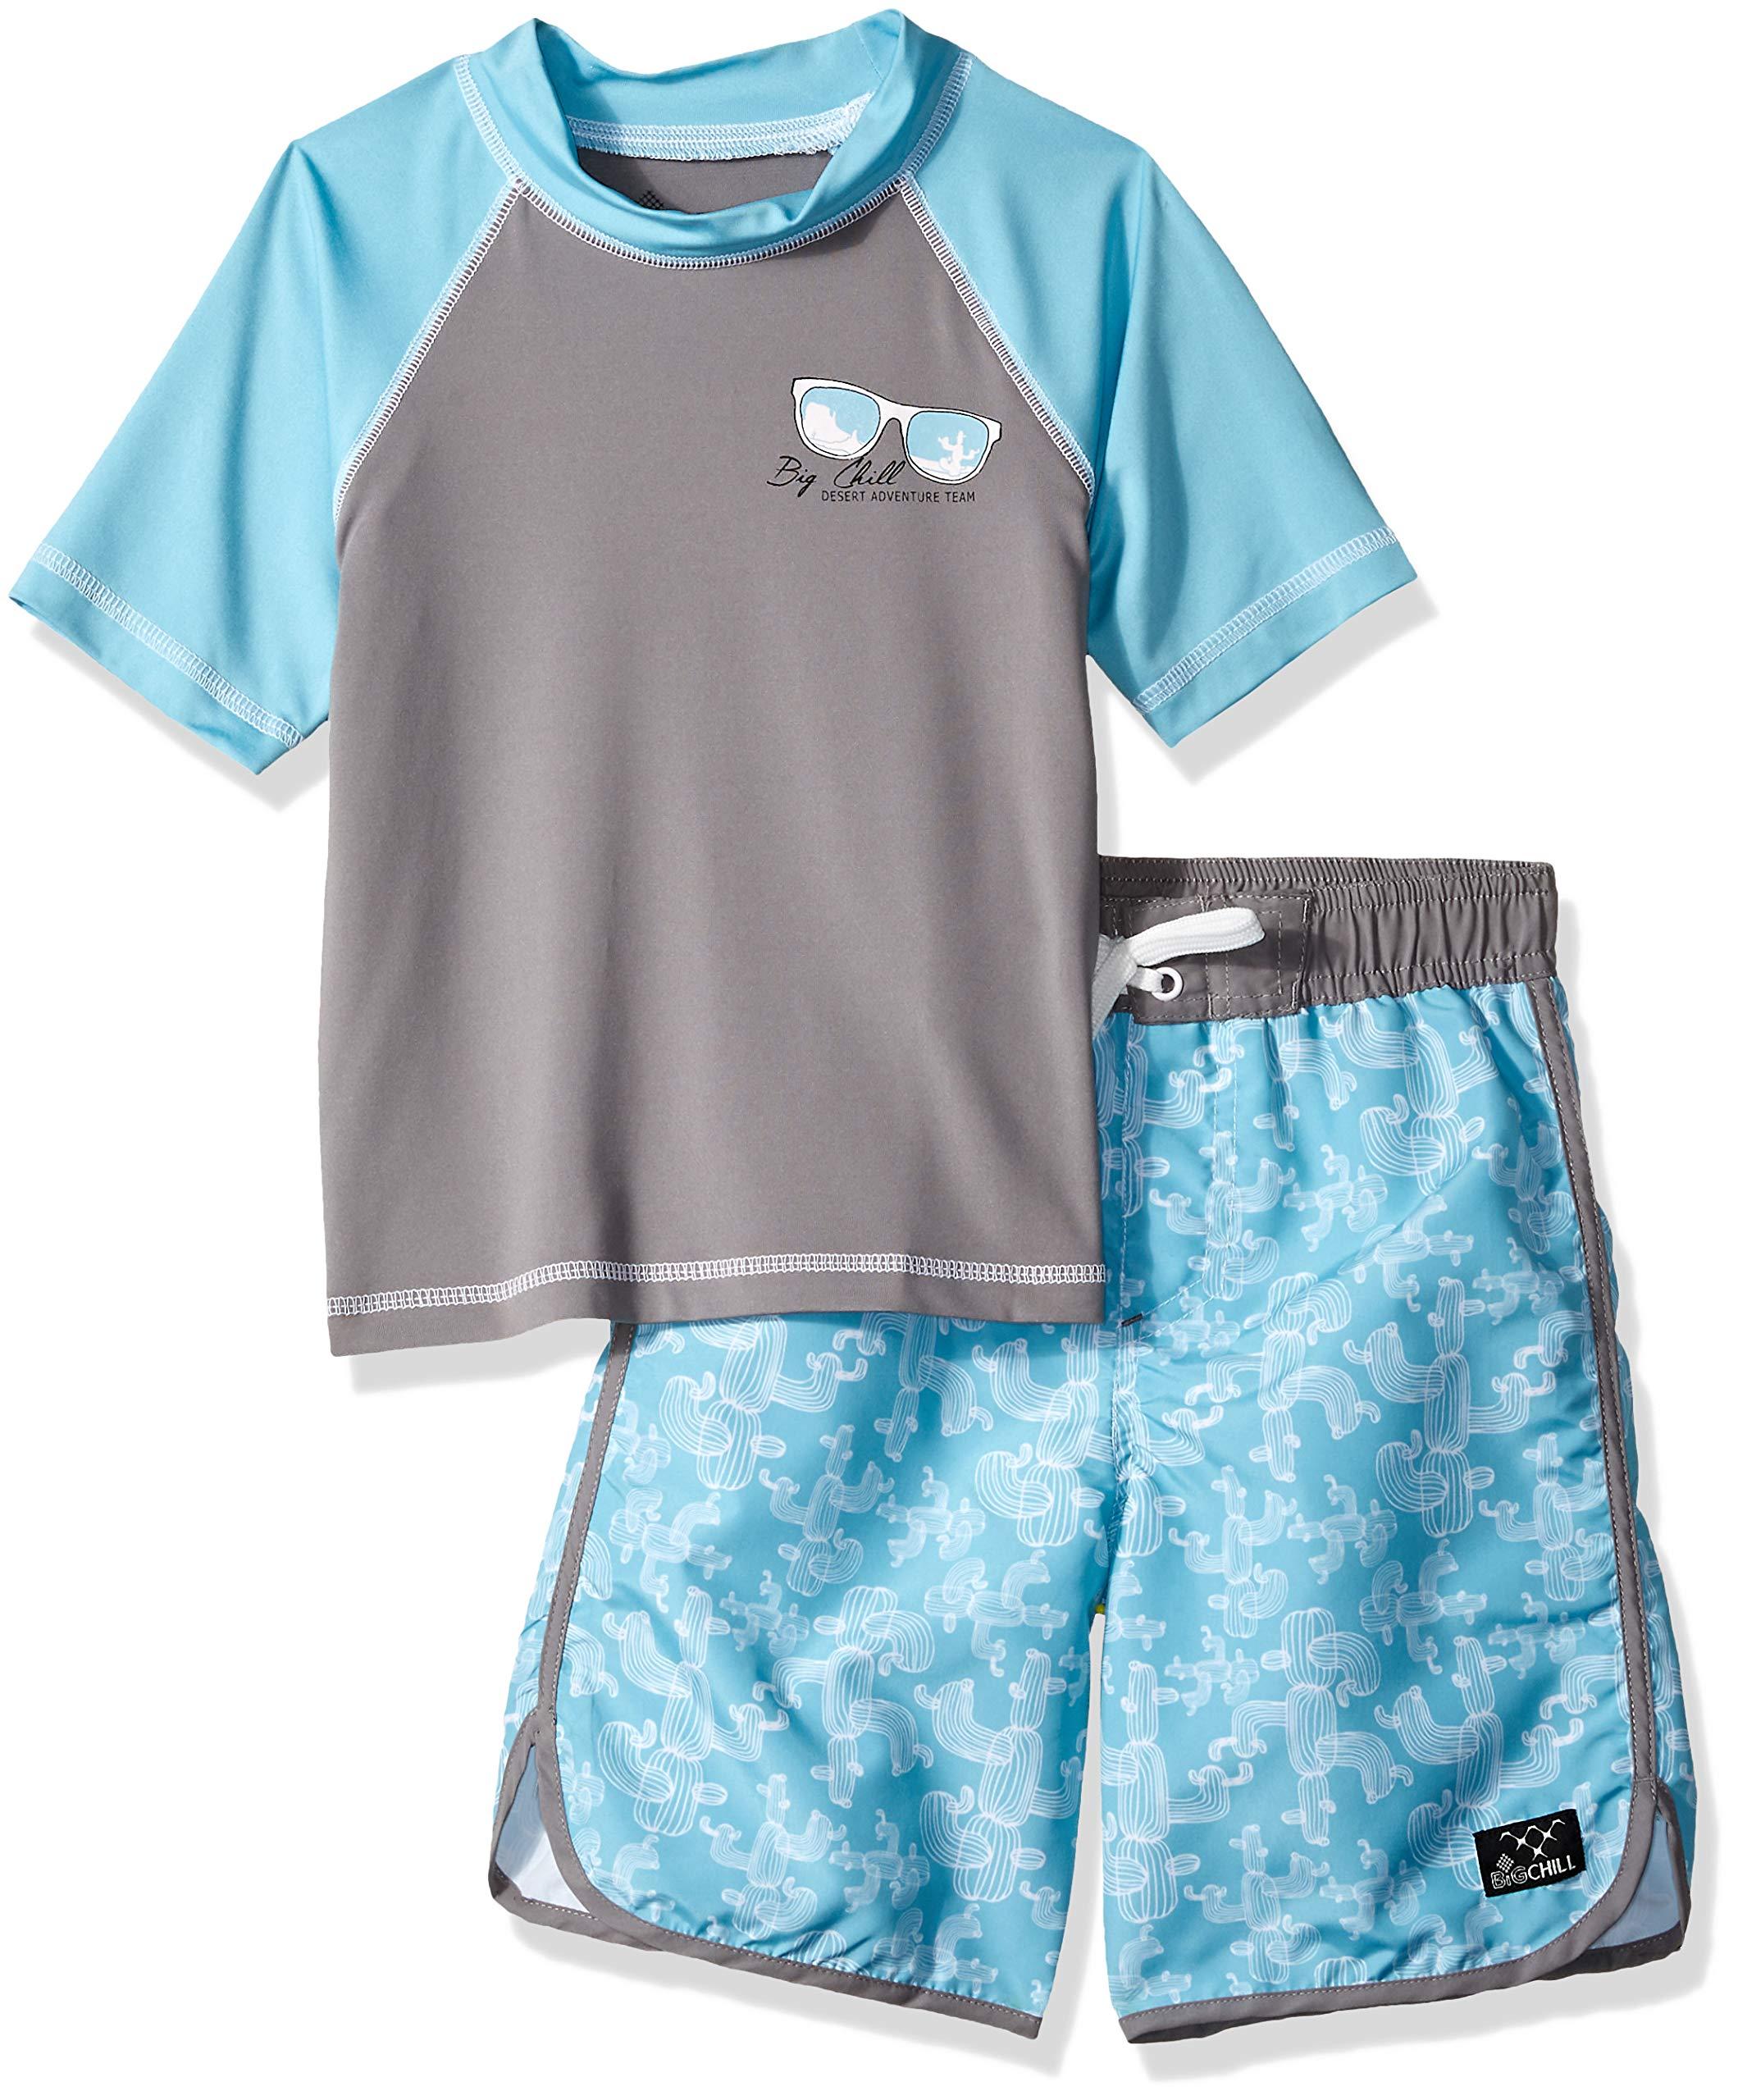 Big Chill Little Boys' Short Sleeve Rashguard Sets, Cactus Blue, 6